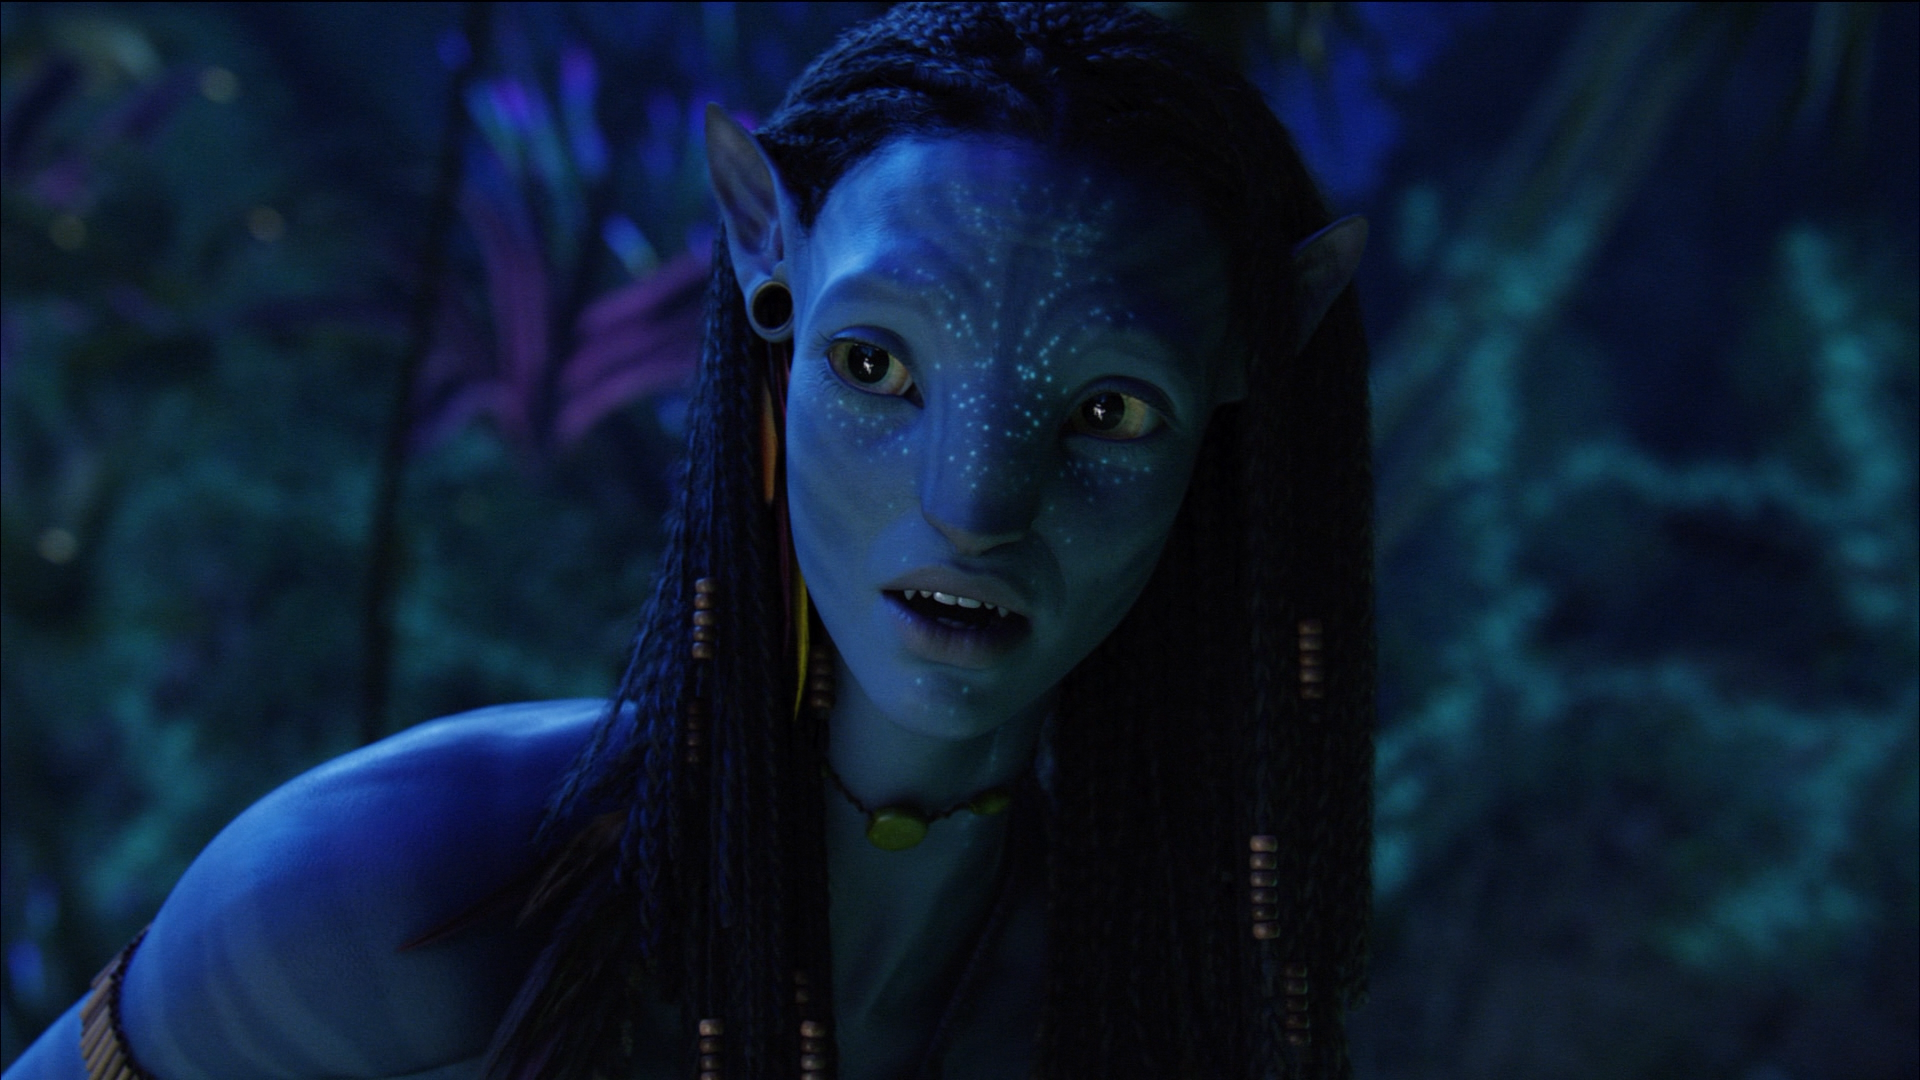 Avatar neytiri by eraocean